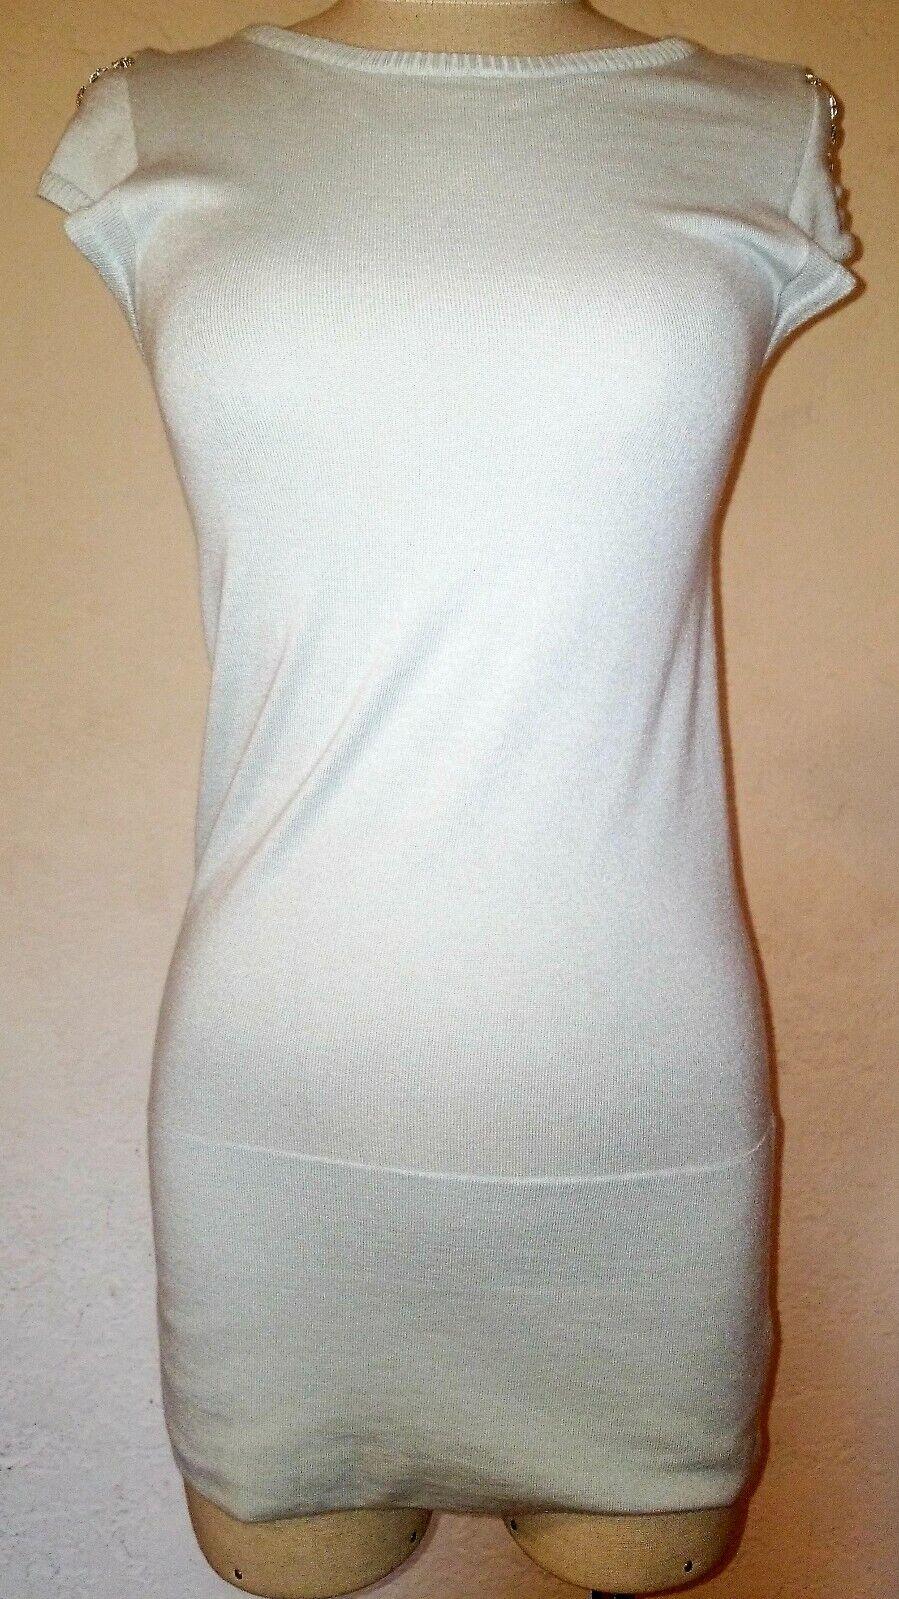 Iisli Sky Blau Cashmere Long Tee Shirt Größe PT NWT Retails over